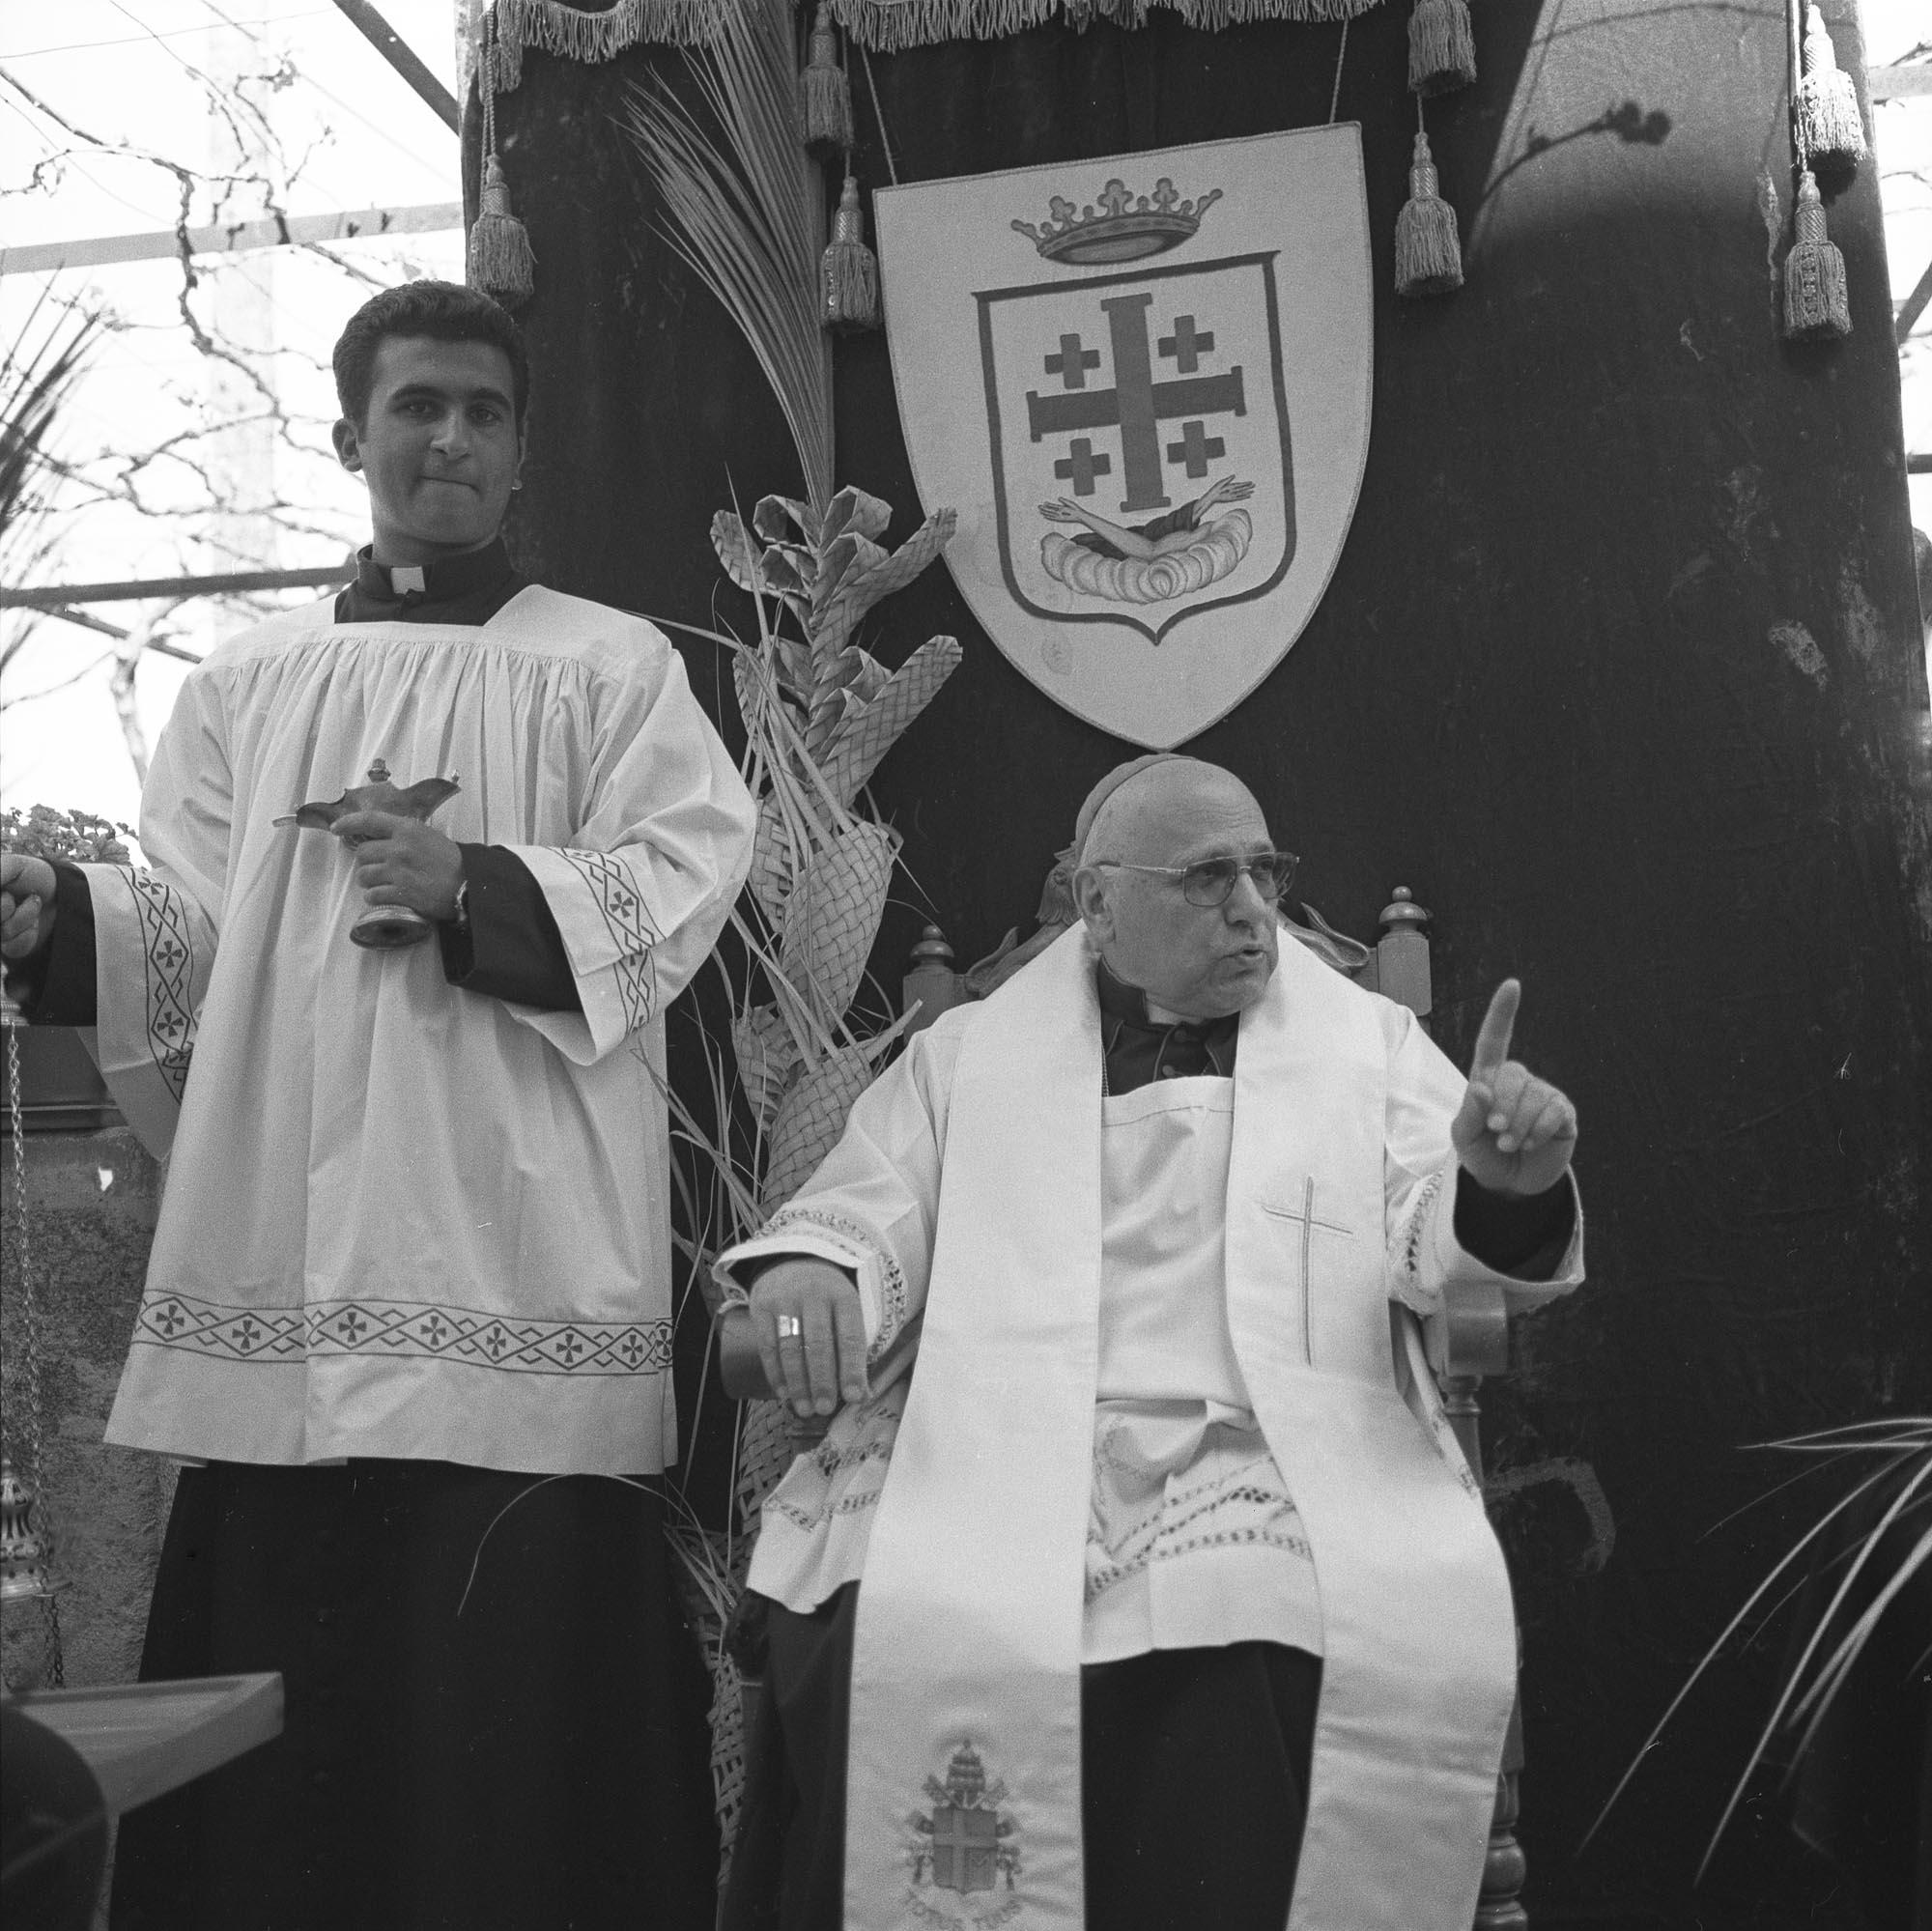 Michel Sabbah, First Palestinian Archbishop and Latin Patriarch of Jerusalem, 2003